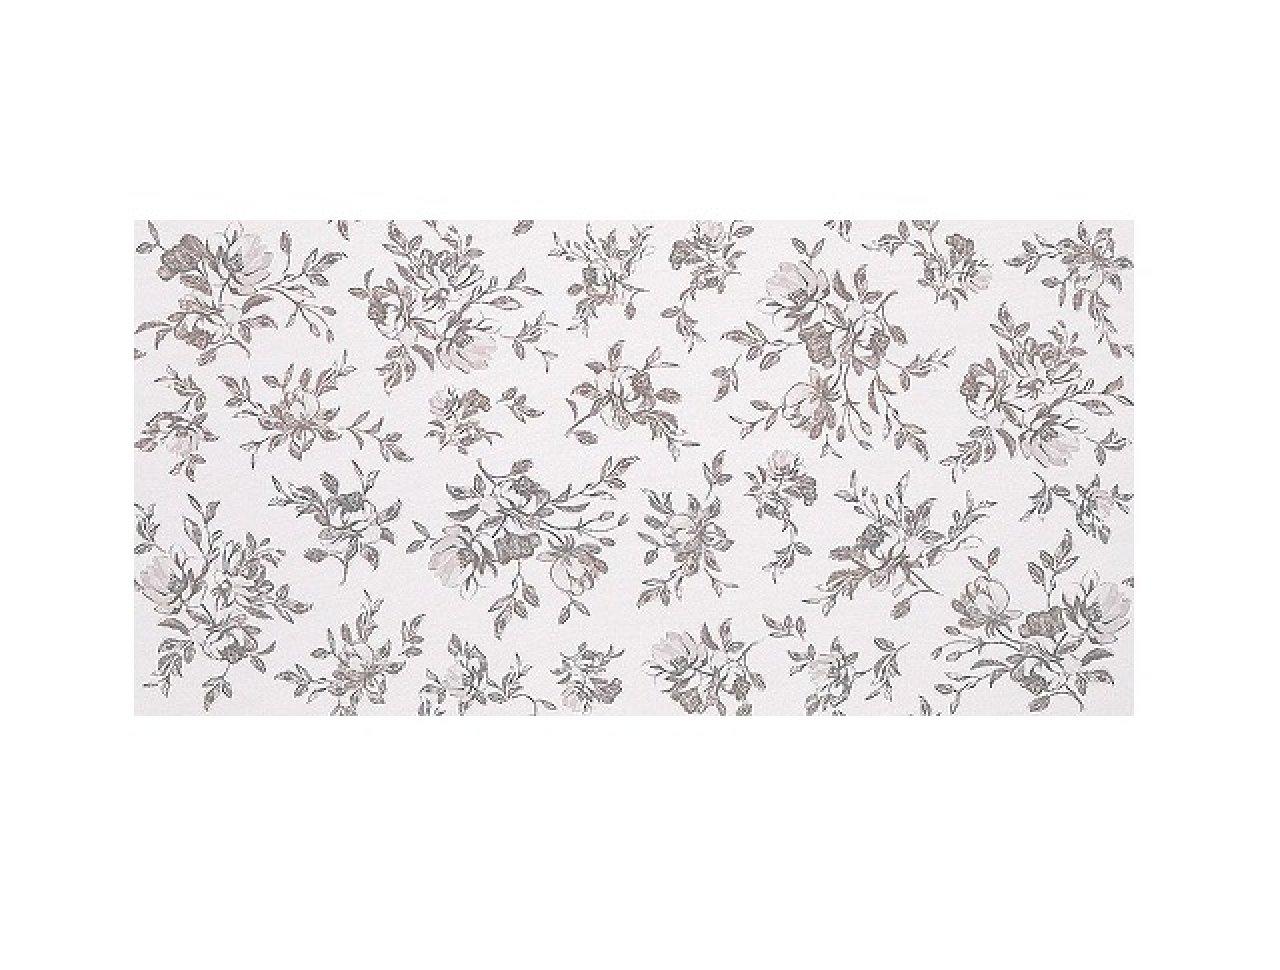 Настенная плитка Magnifique Wallpaper 40x80